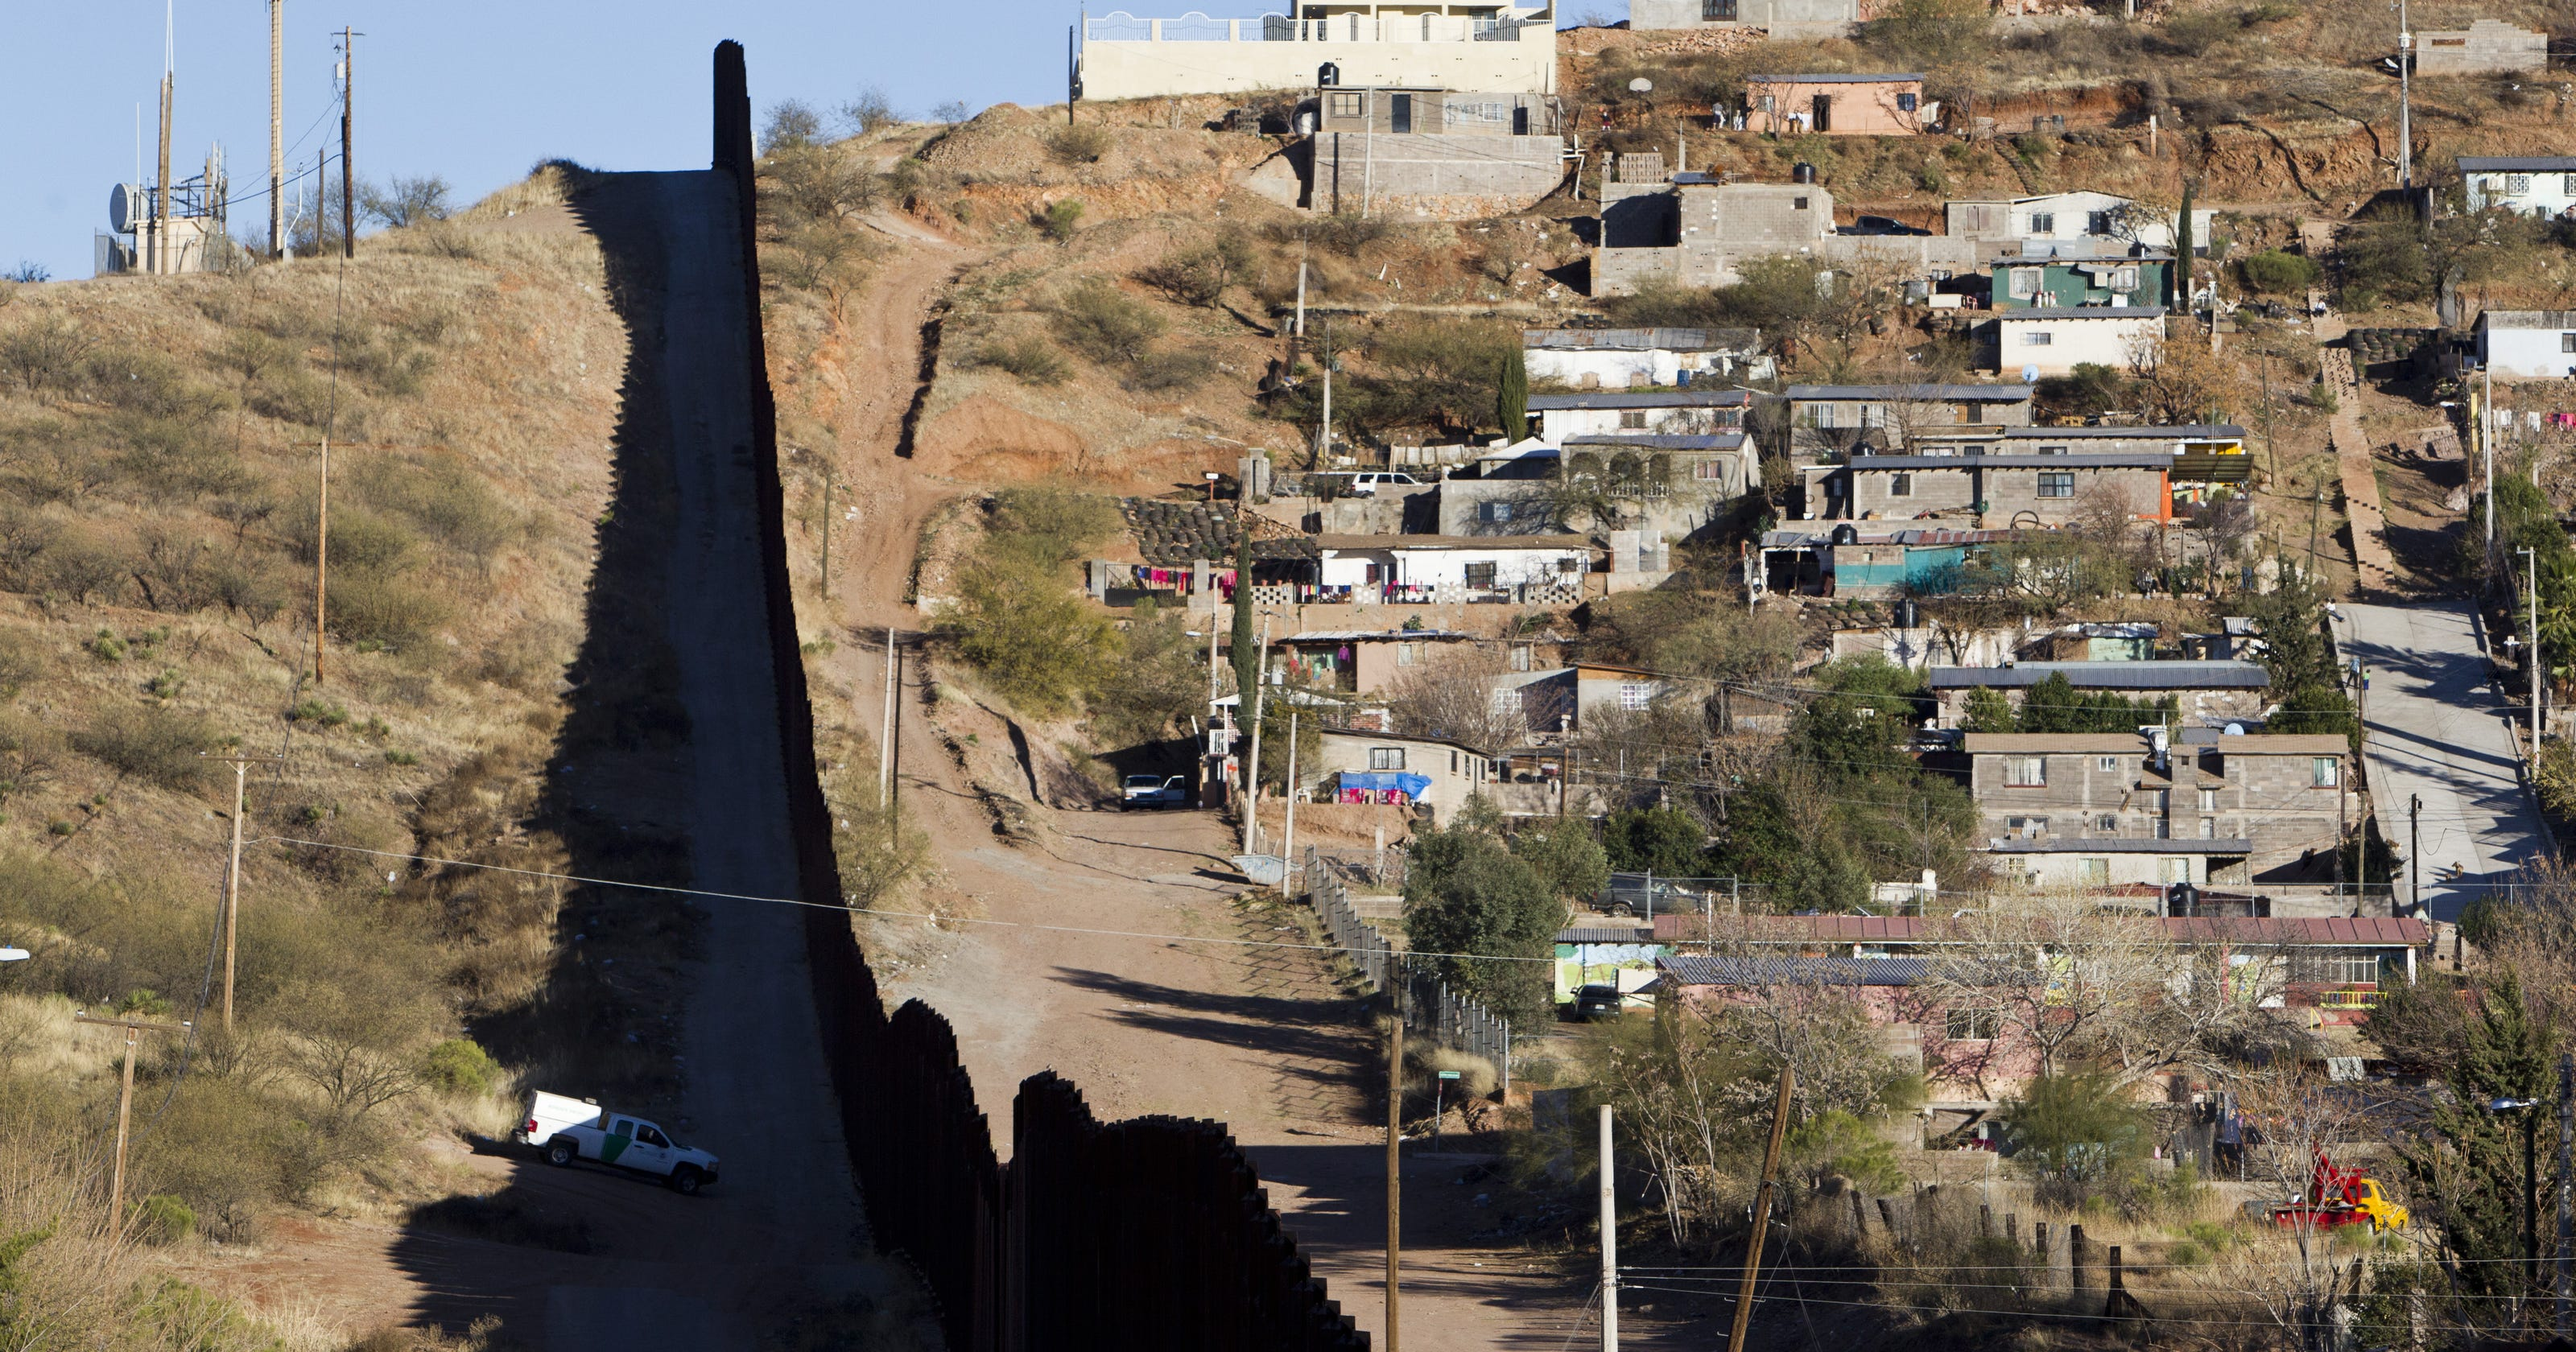 cac18178595d Study: Tighter border brought Arizona more Mexican migrants